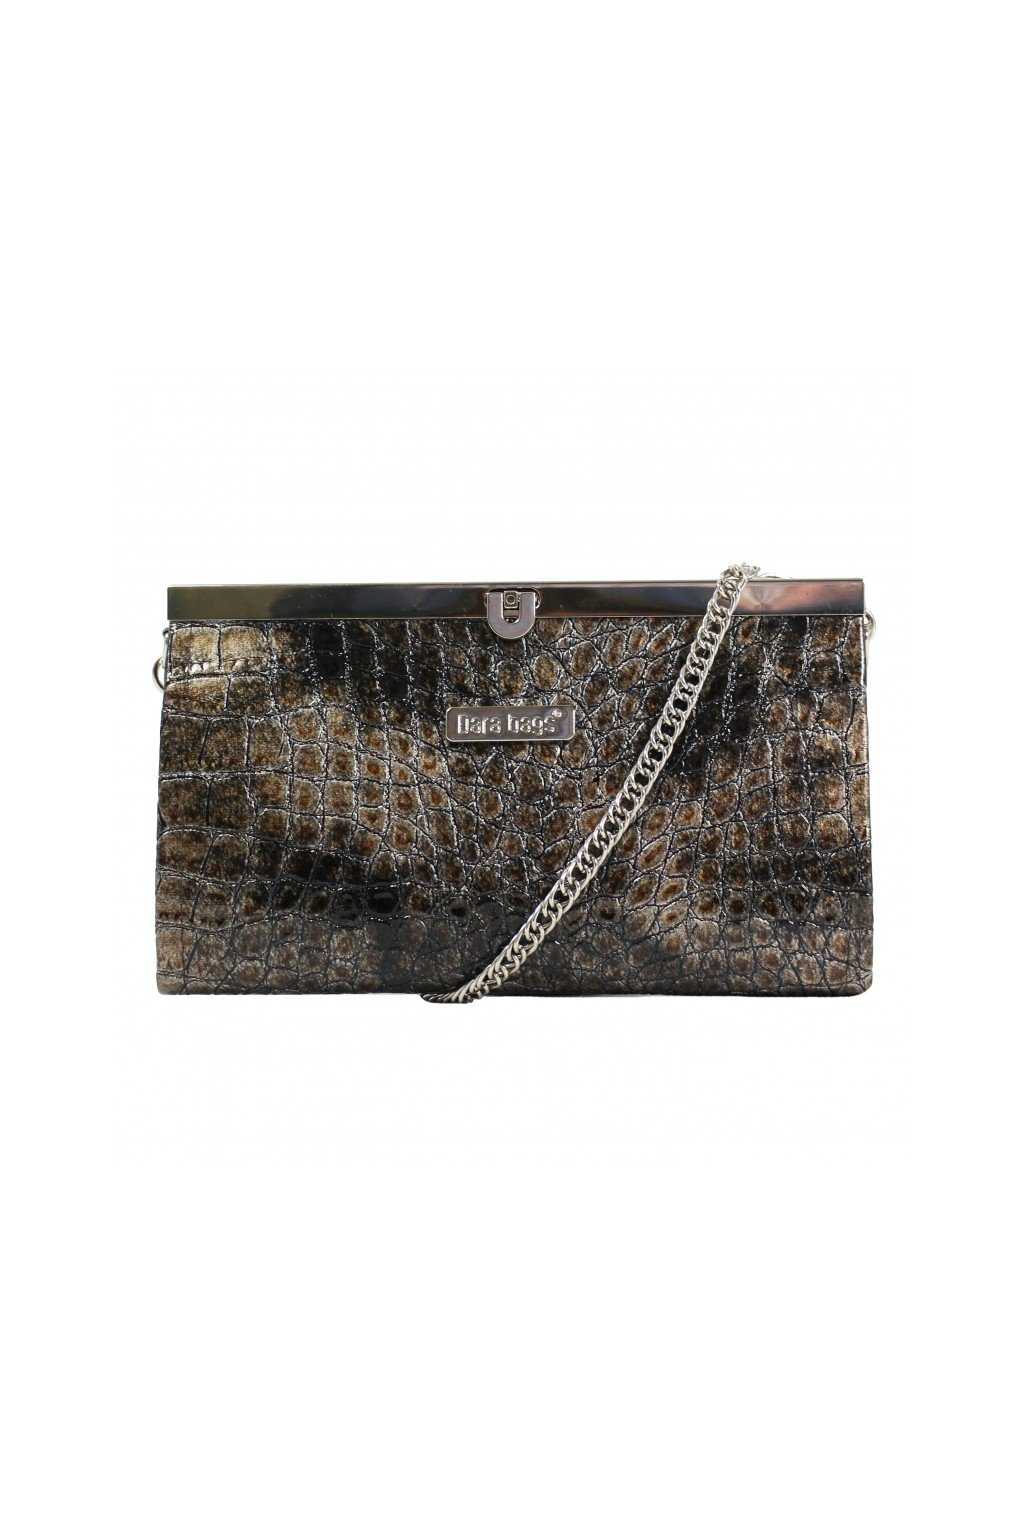 Elegantni mala kabelka Merci Dara bags hneda 1